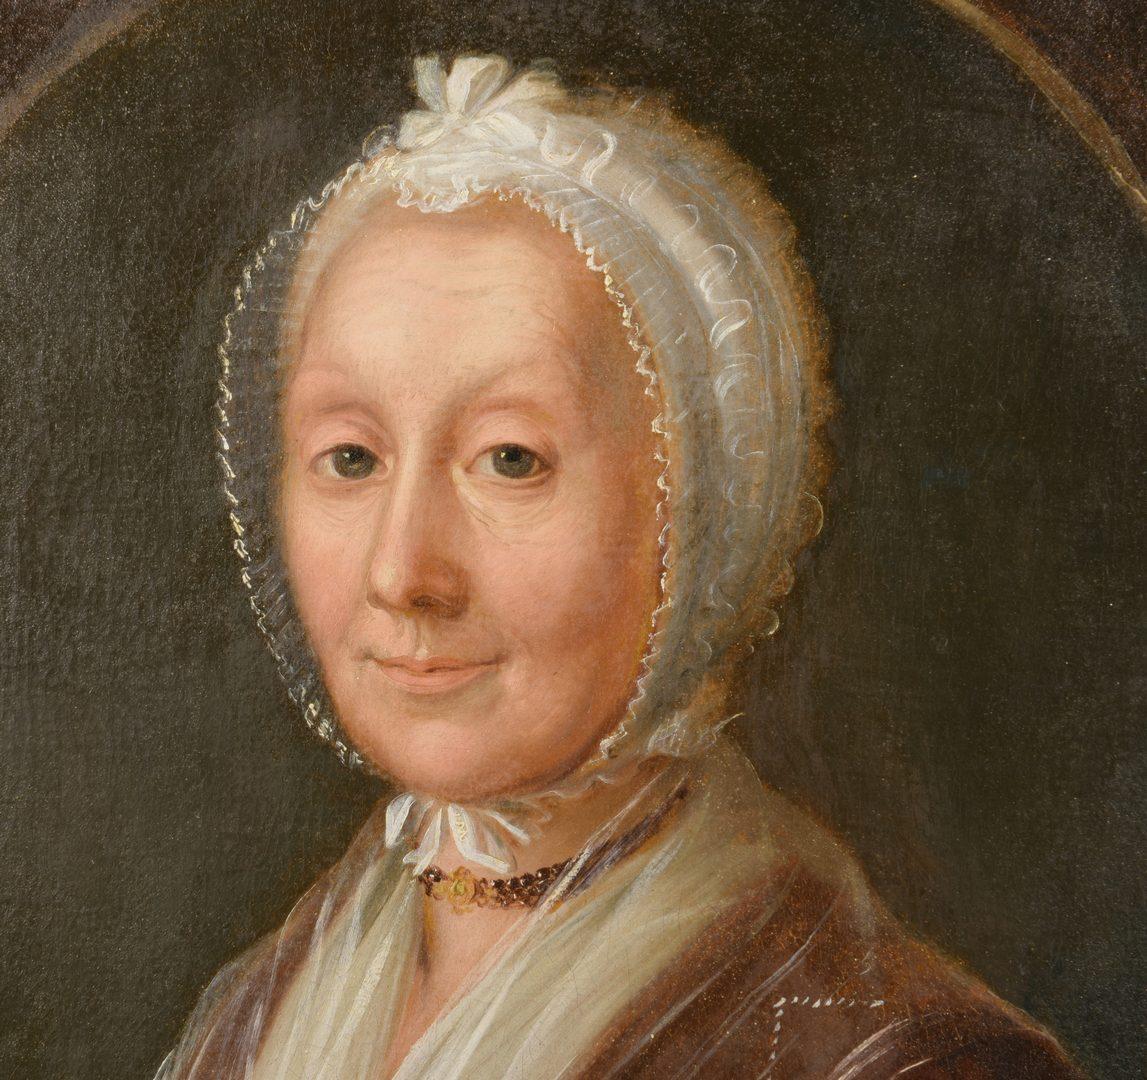 Lot 425: Portrait of a Lady, British School